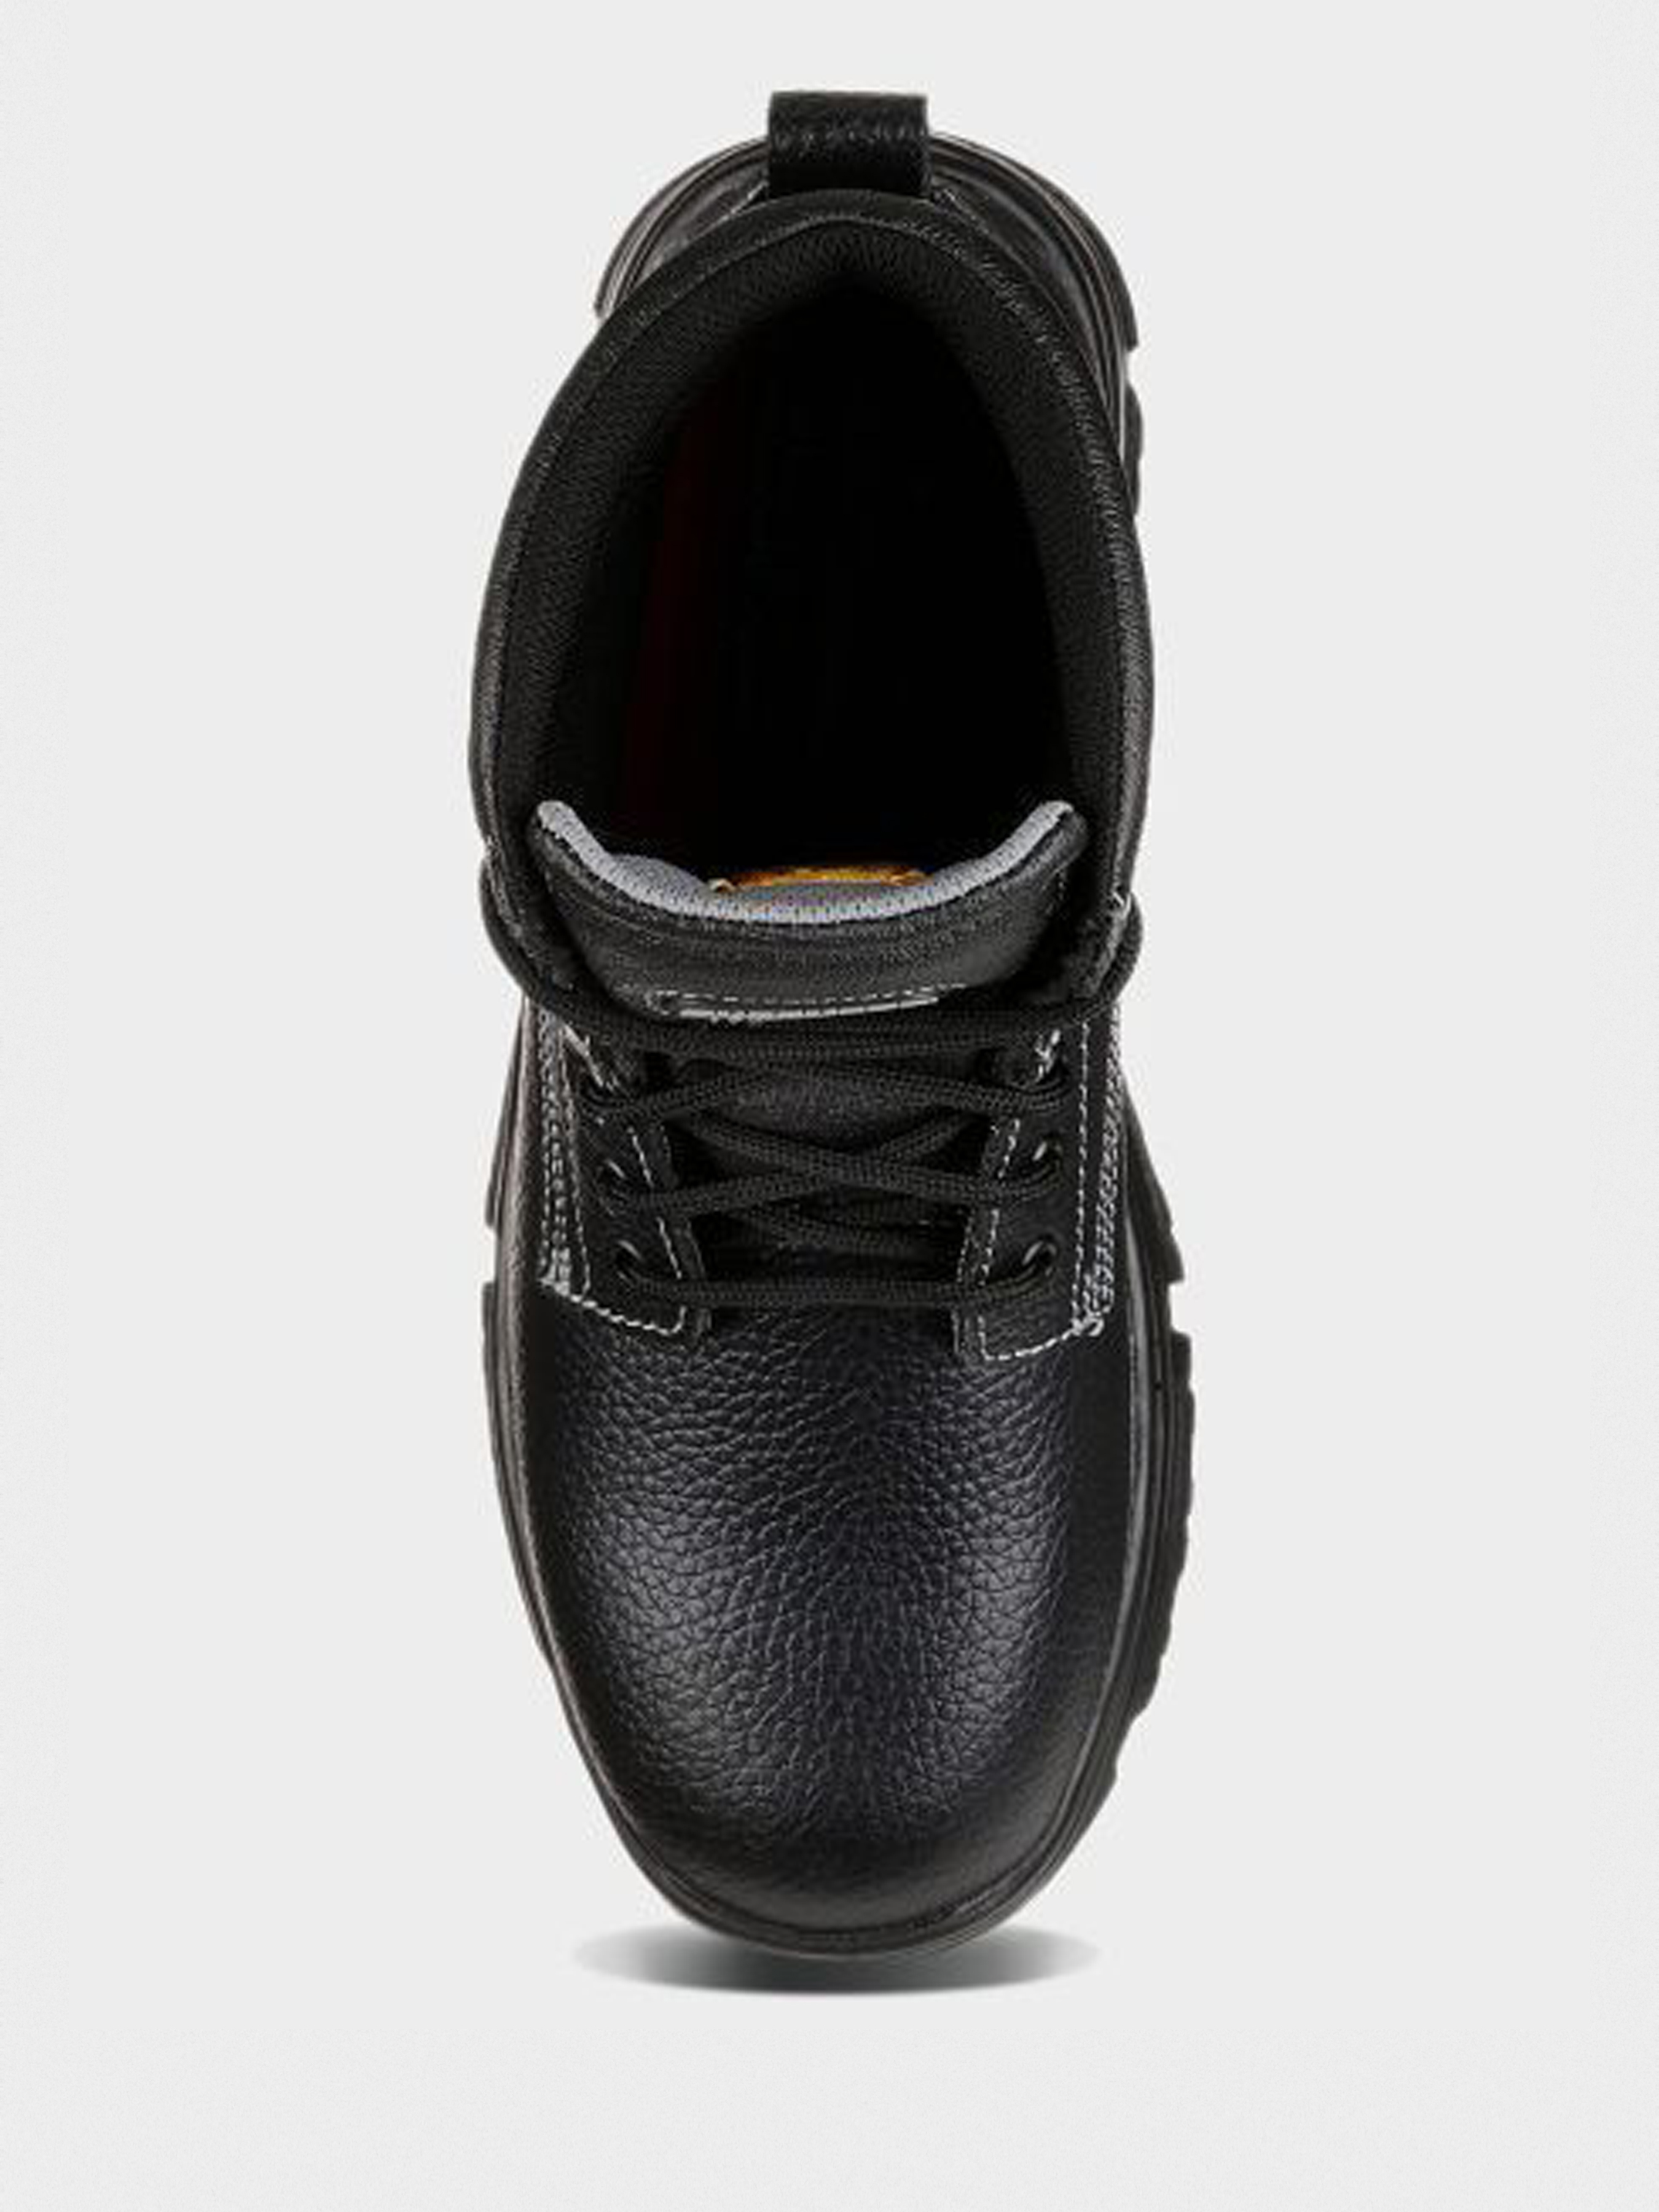 Ботинки для мужчин Skechers KM3416 модная обувь, 2017